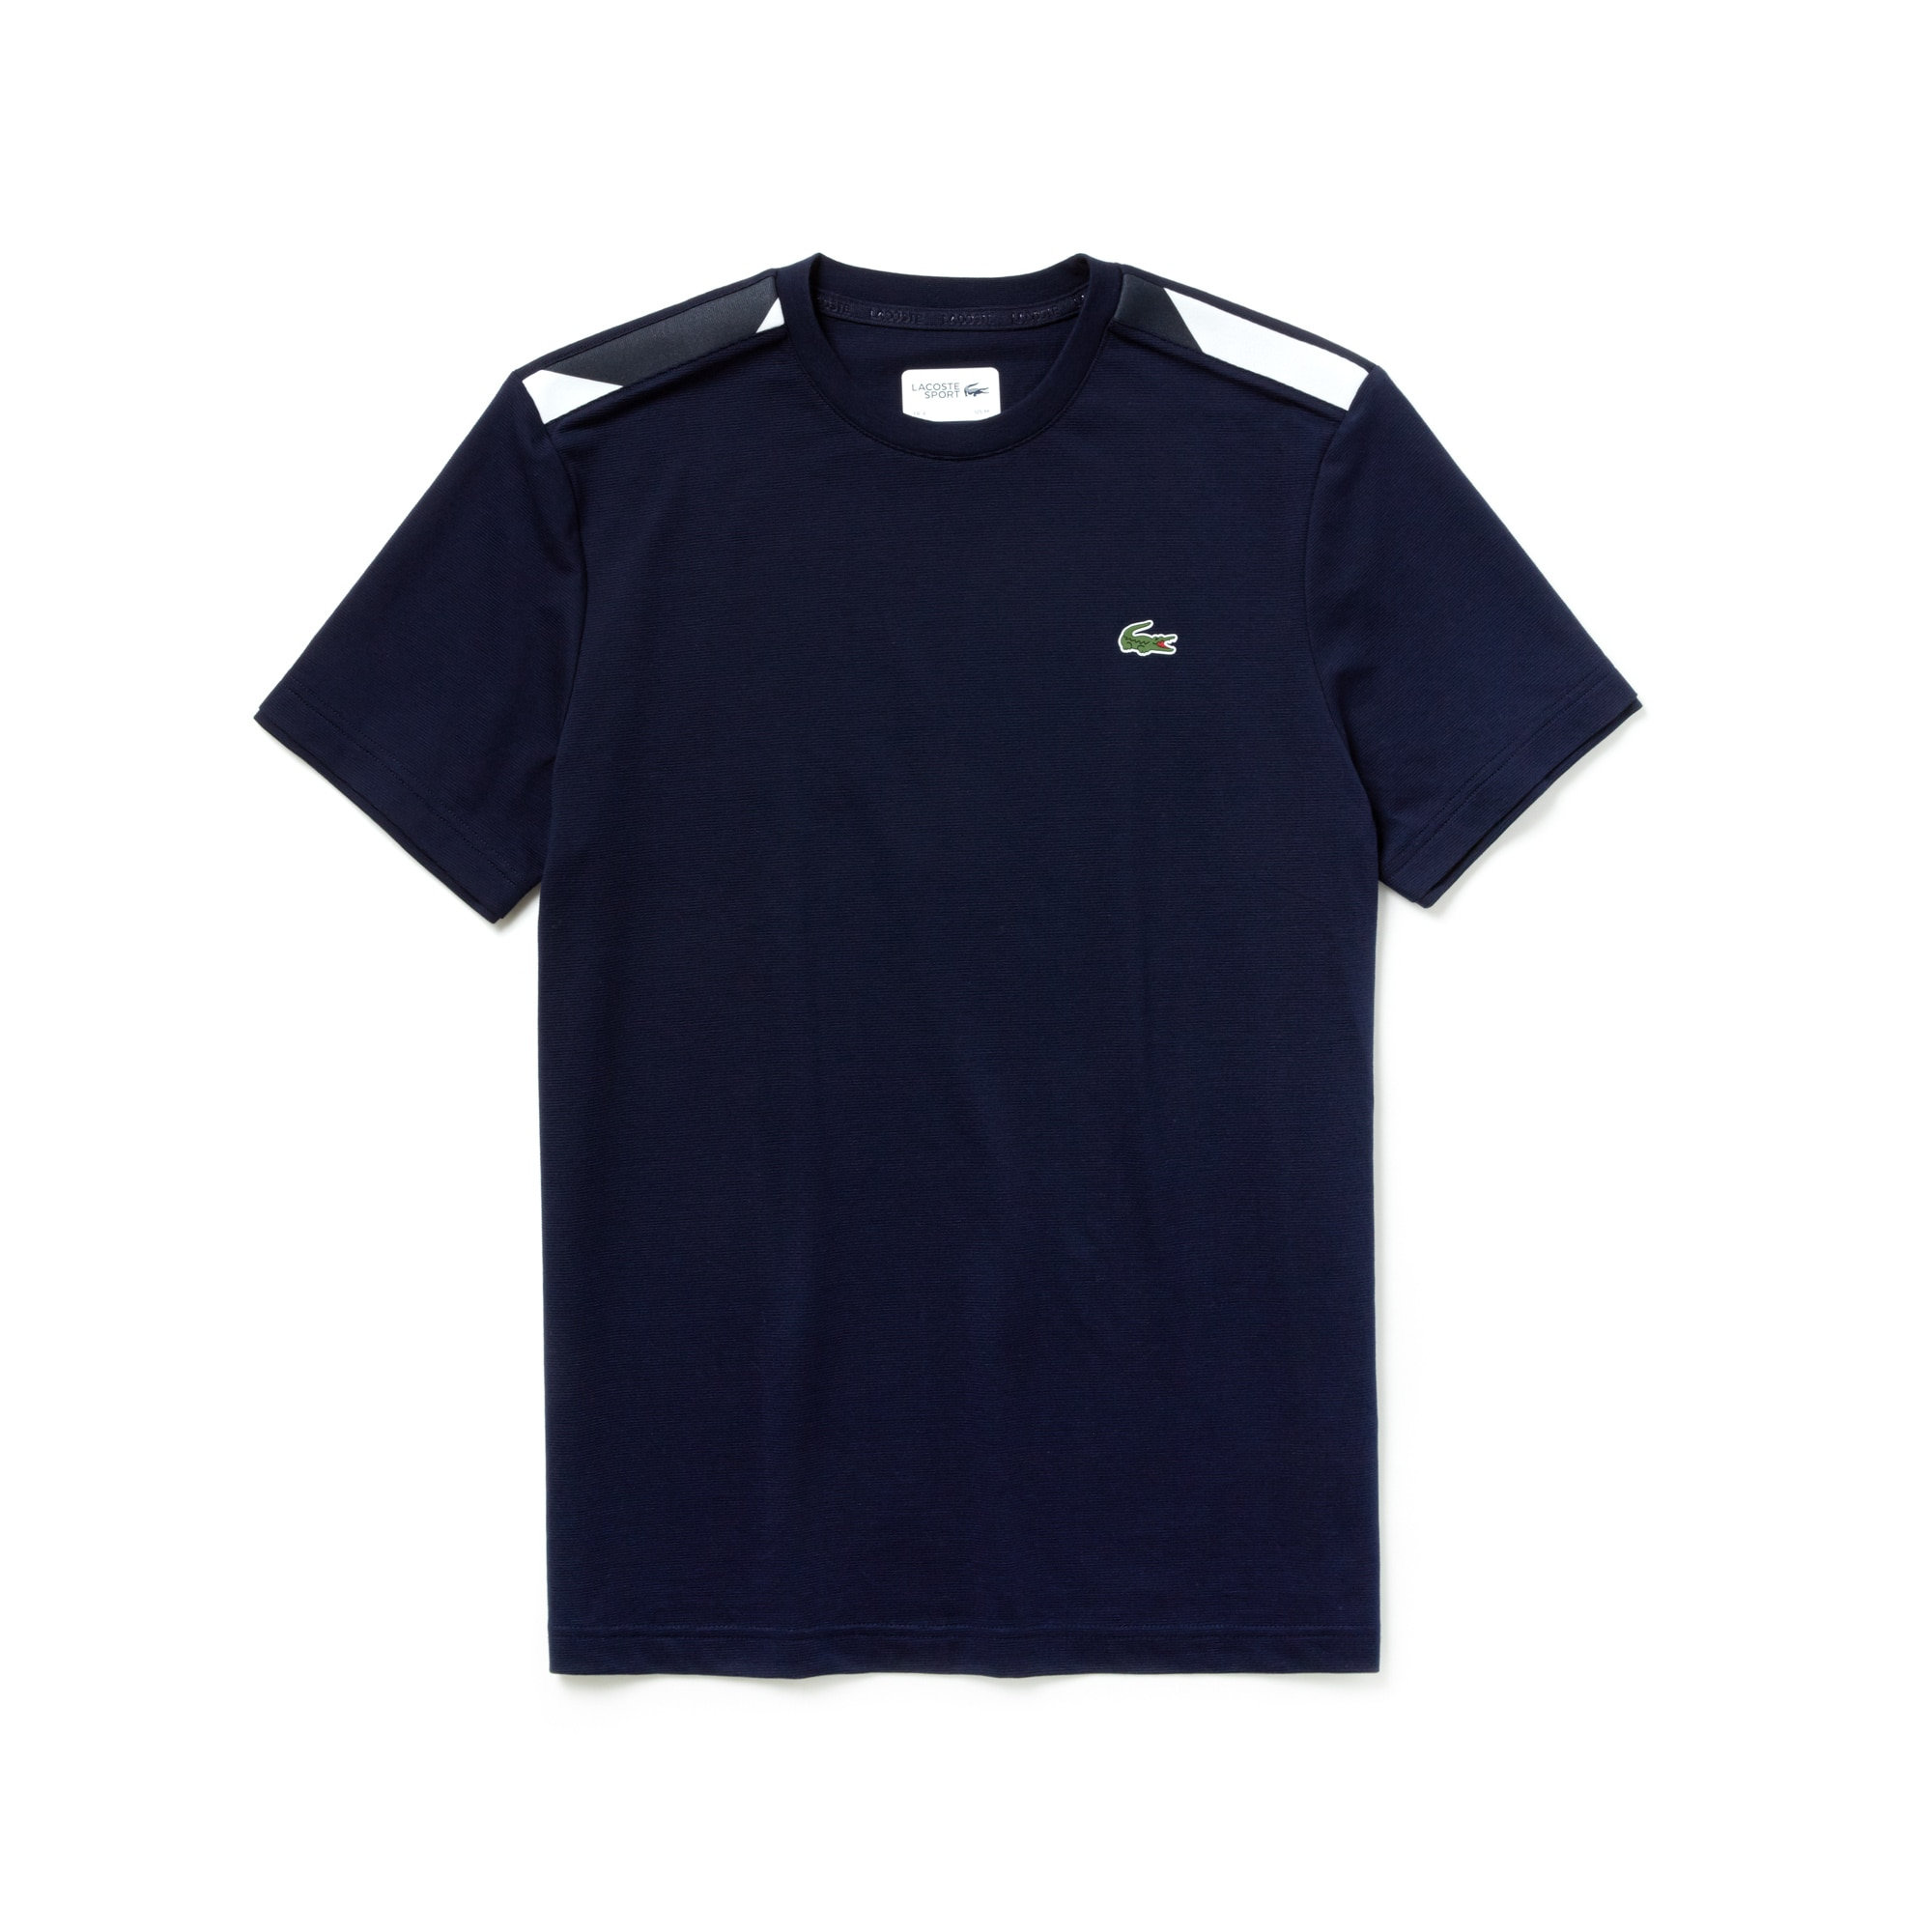 Herren LACOSTE SPORT Tennis-T-Shirt mit Kontrast-Akzenten